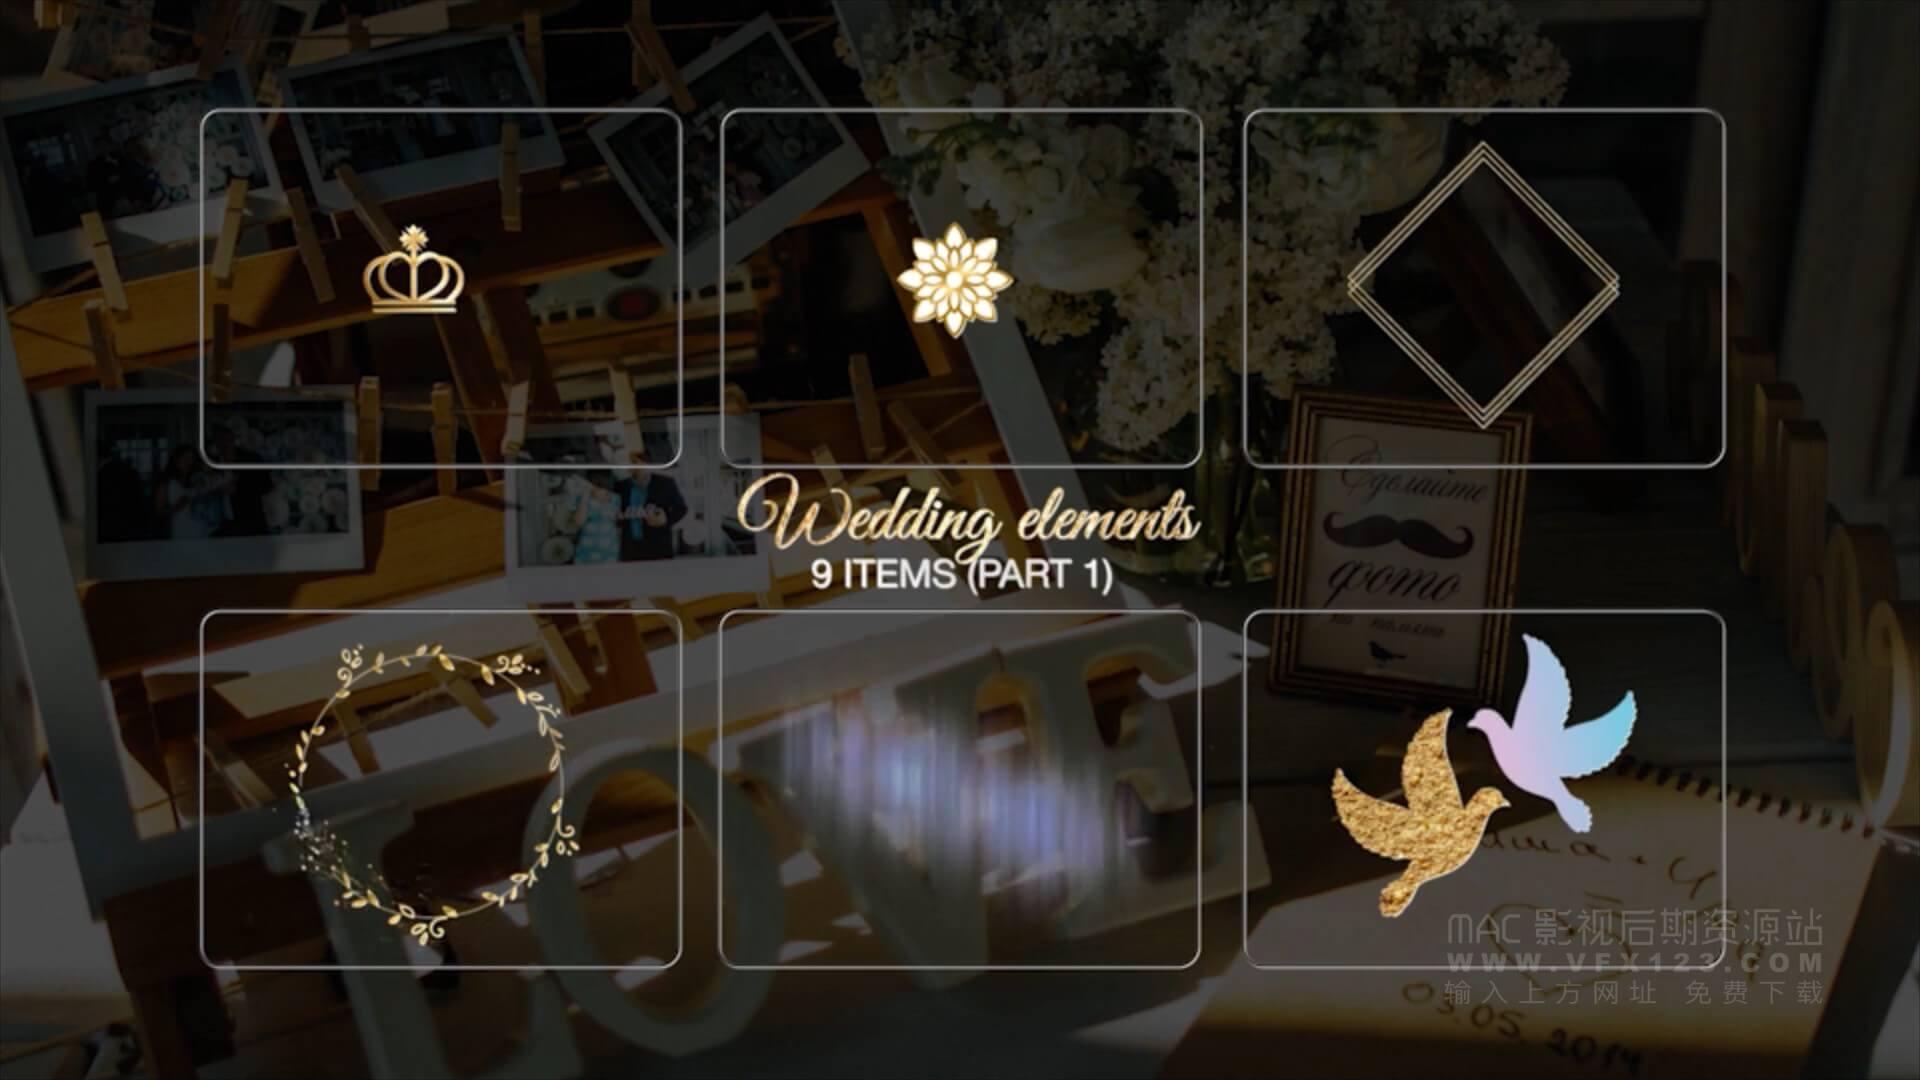 Ae模板 婚礼视频标题制作素材包 Luxory Wedding Title Kit